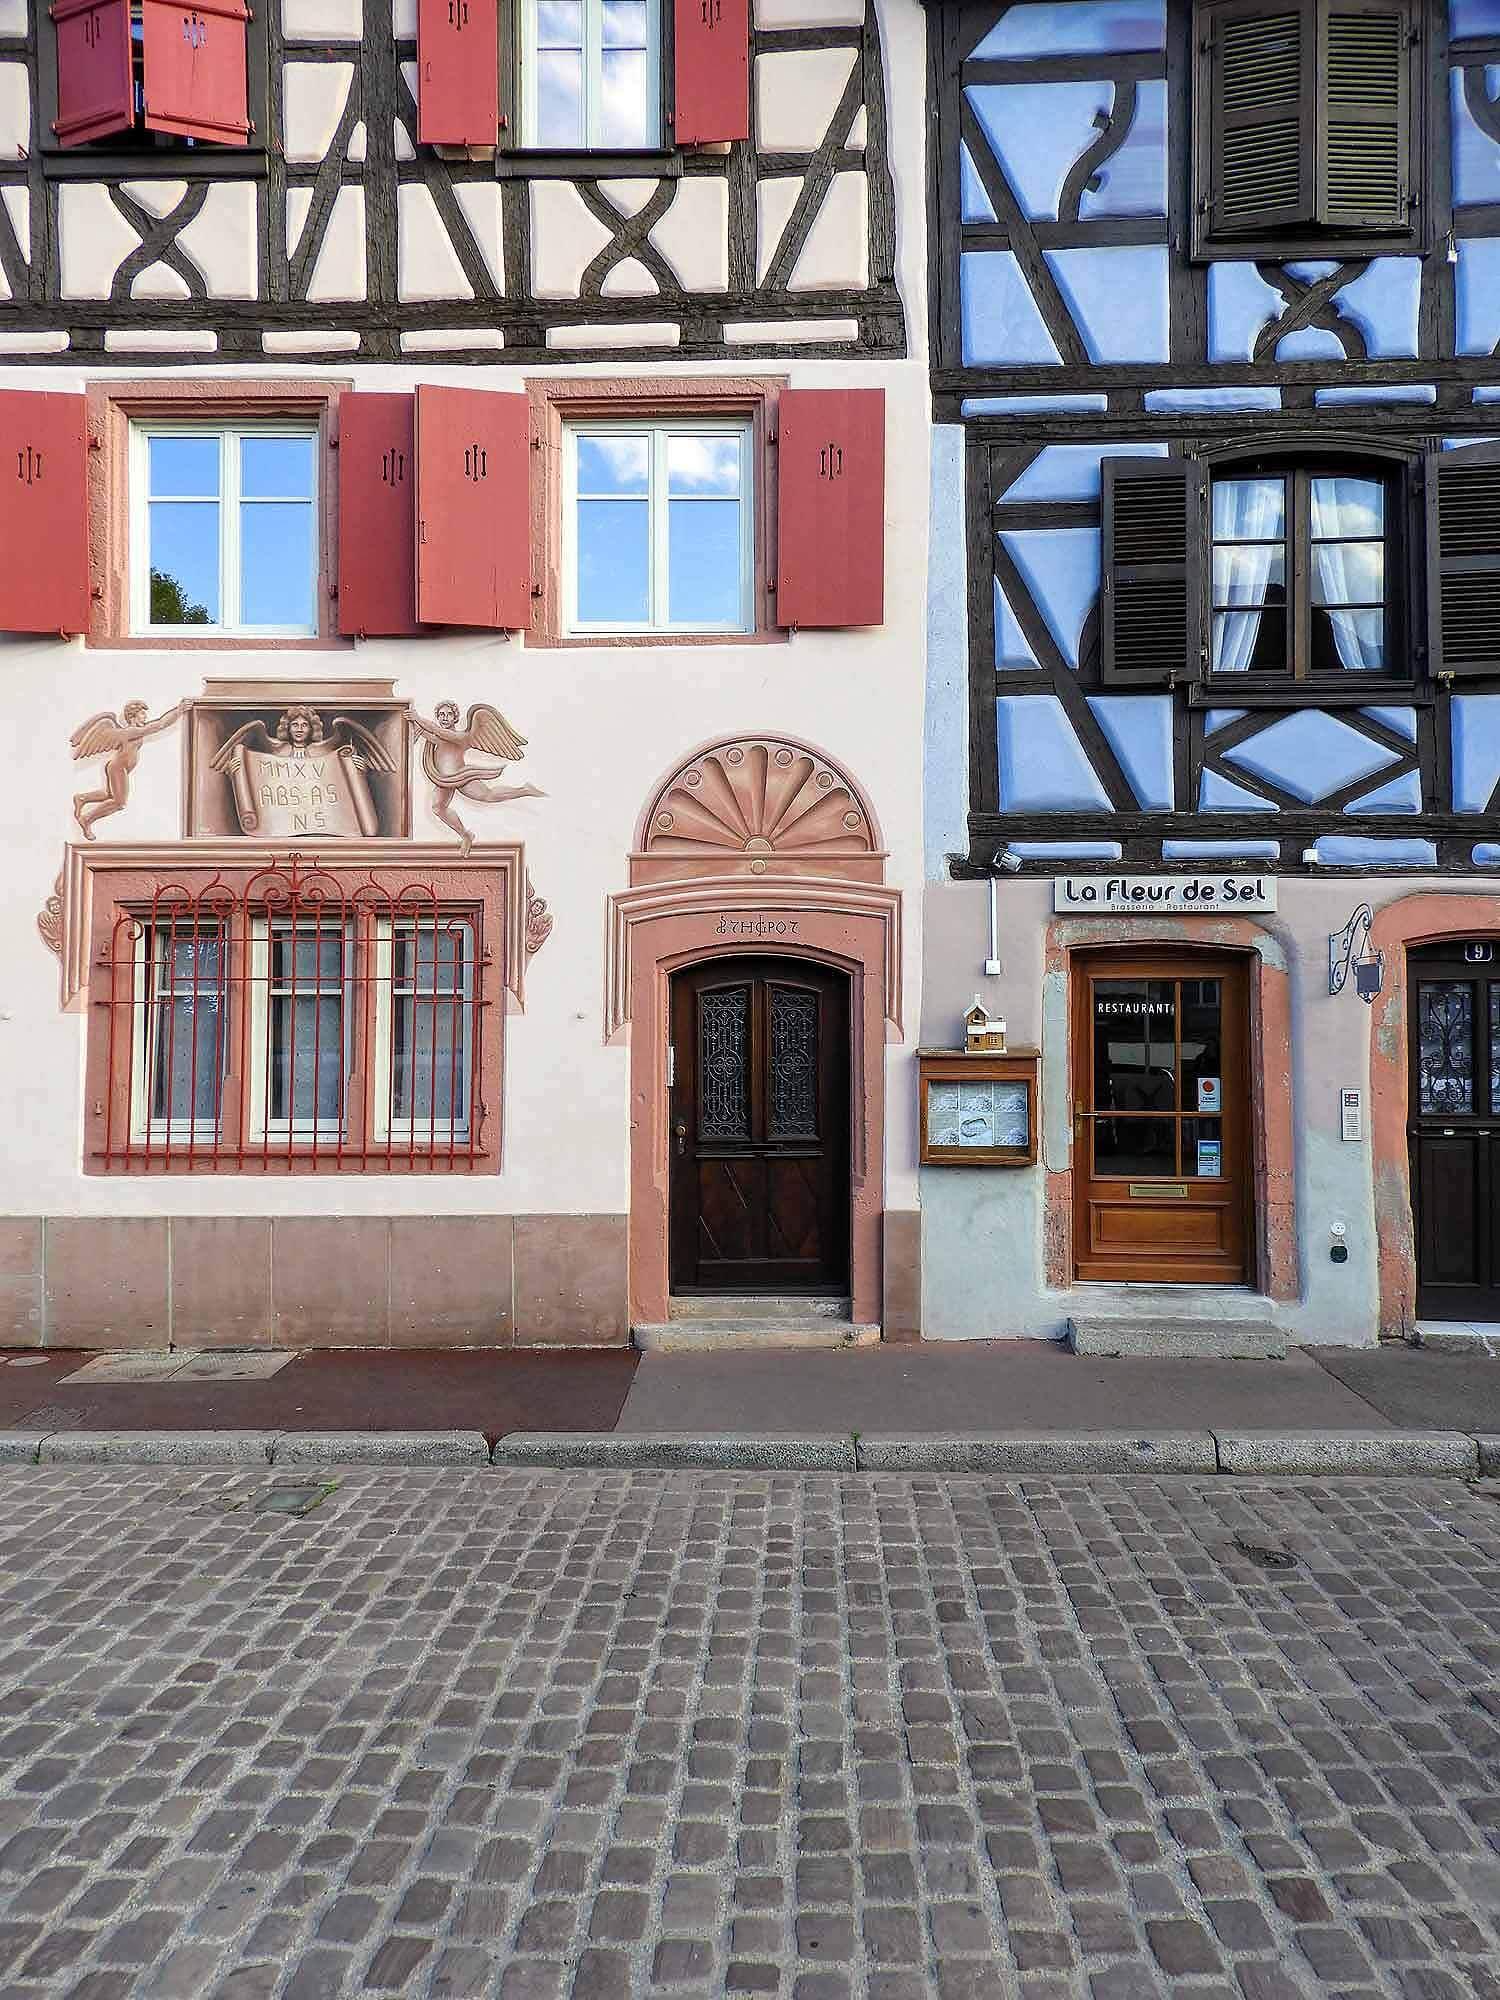 france-colmar-town-apartments-colors-pastel.jpg